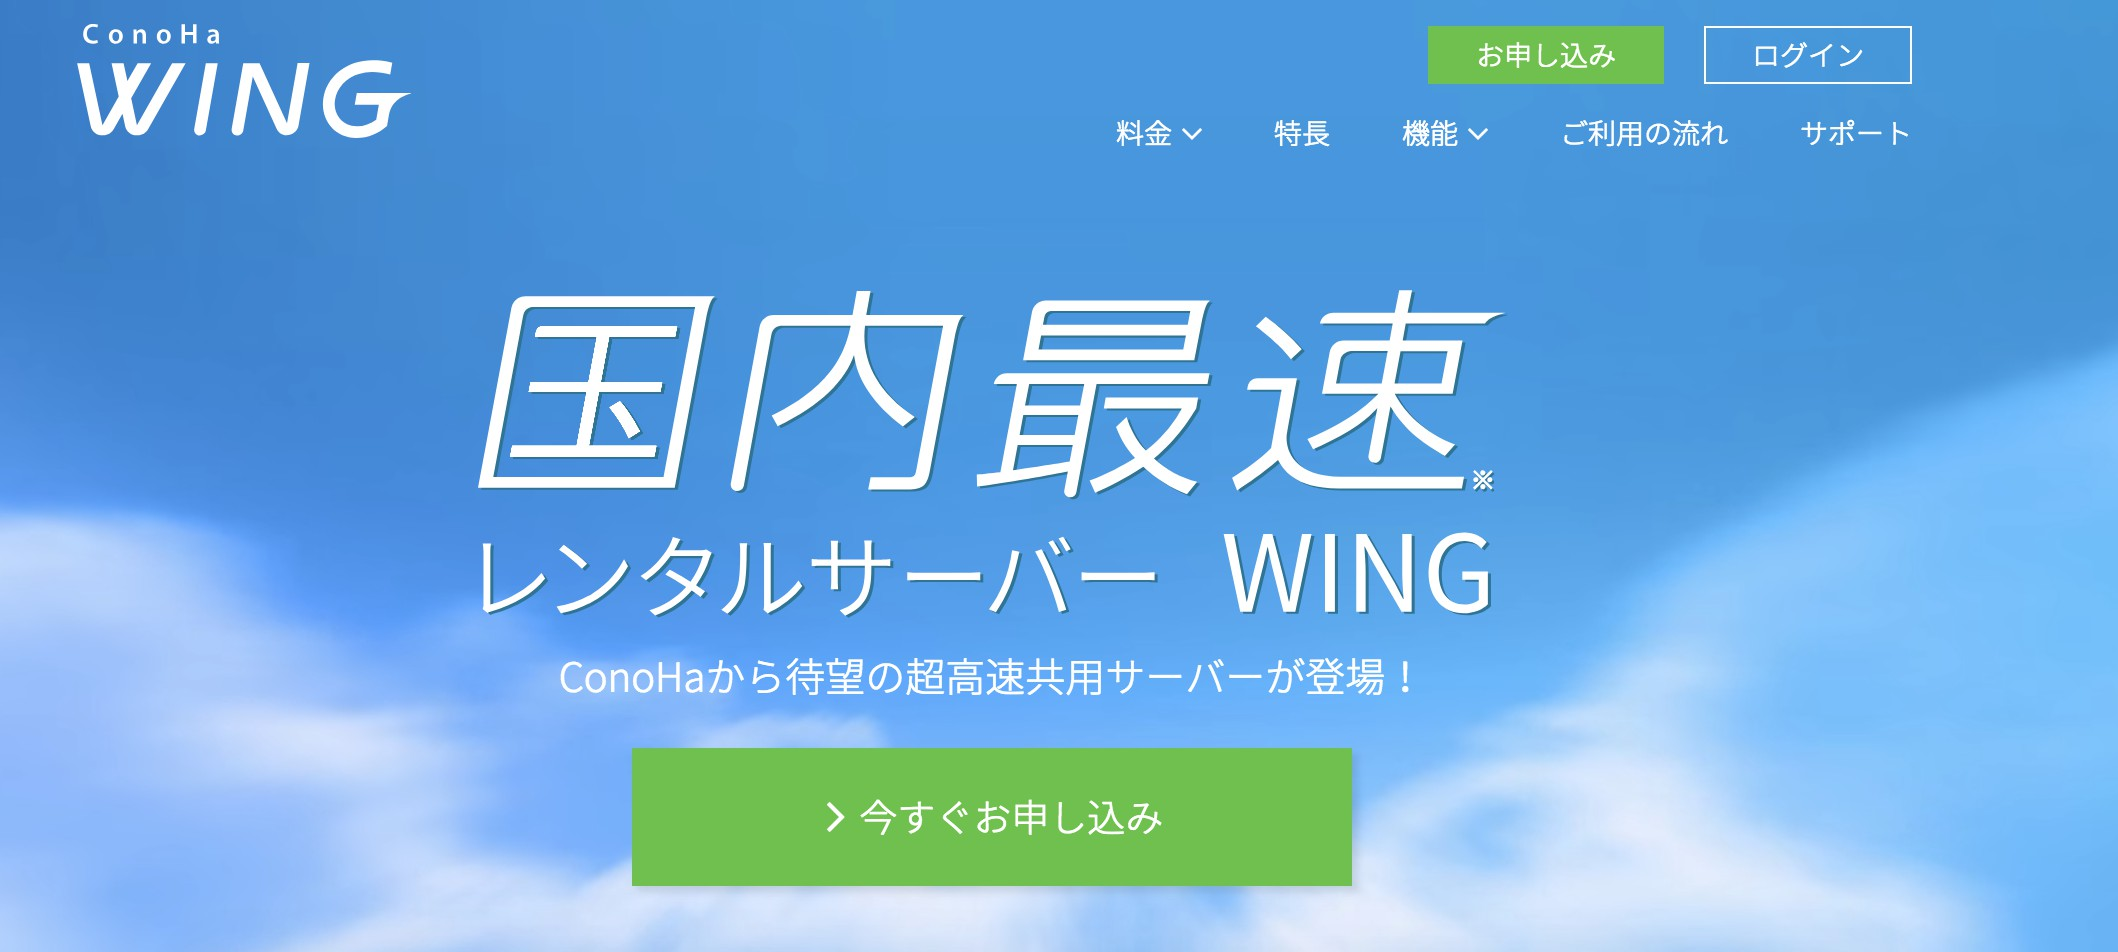 Conoha Wingの評判は?エックスサーバーと比較して早いは本当?移行は簡単?メリット・デメリットを利用者が解説